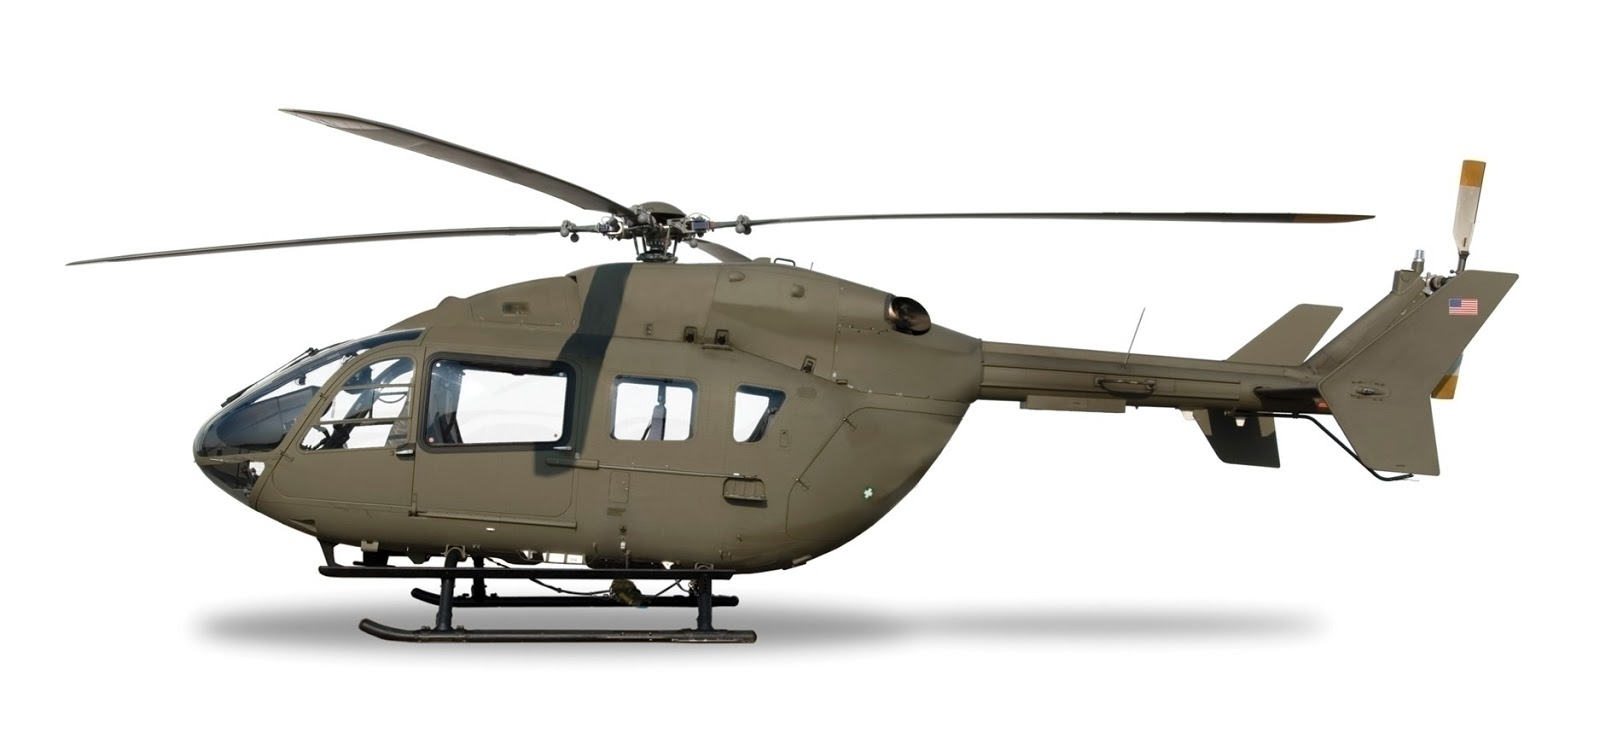 uh 72a lakota light utility helicopter with Uh 72a Lakota on Uh 72 Lakota Could Be A Candidate For Air Force Duty likewise Uh 72a Lakota Light Utility Helicopters additionally 16728 also Eurocopter Uh 72 Lakota also Uh 72a Lakota.